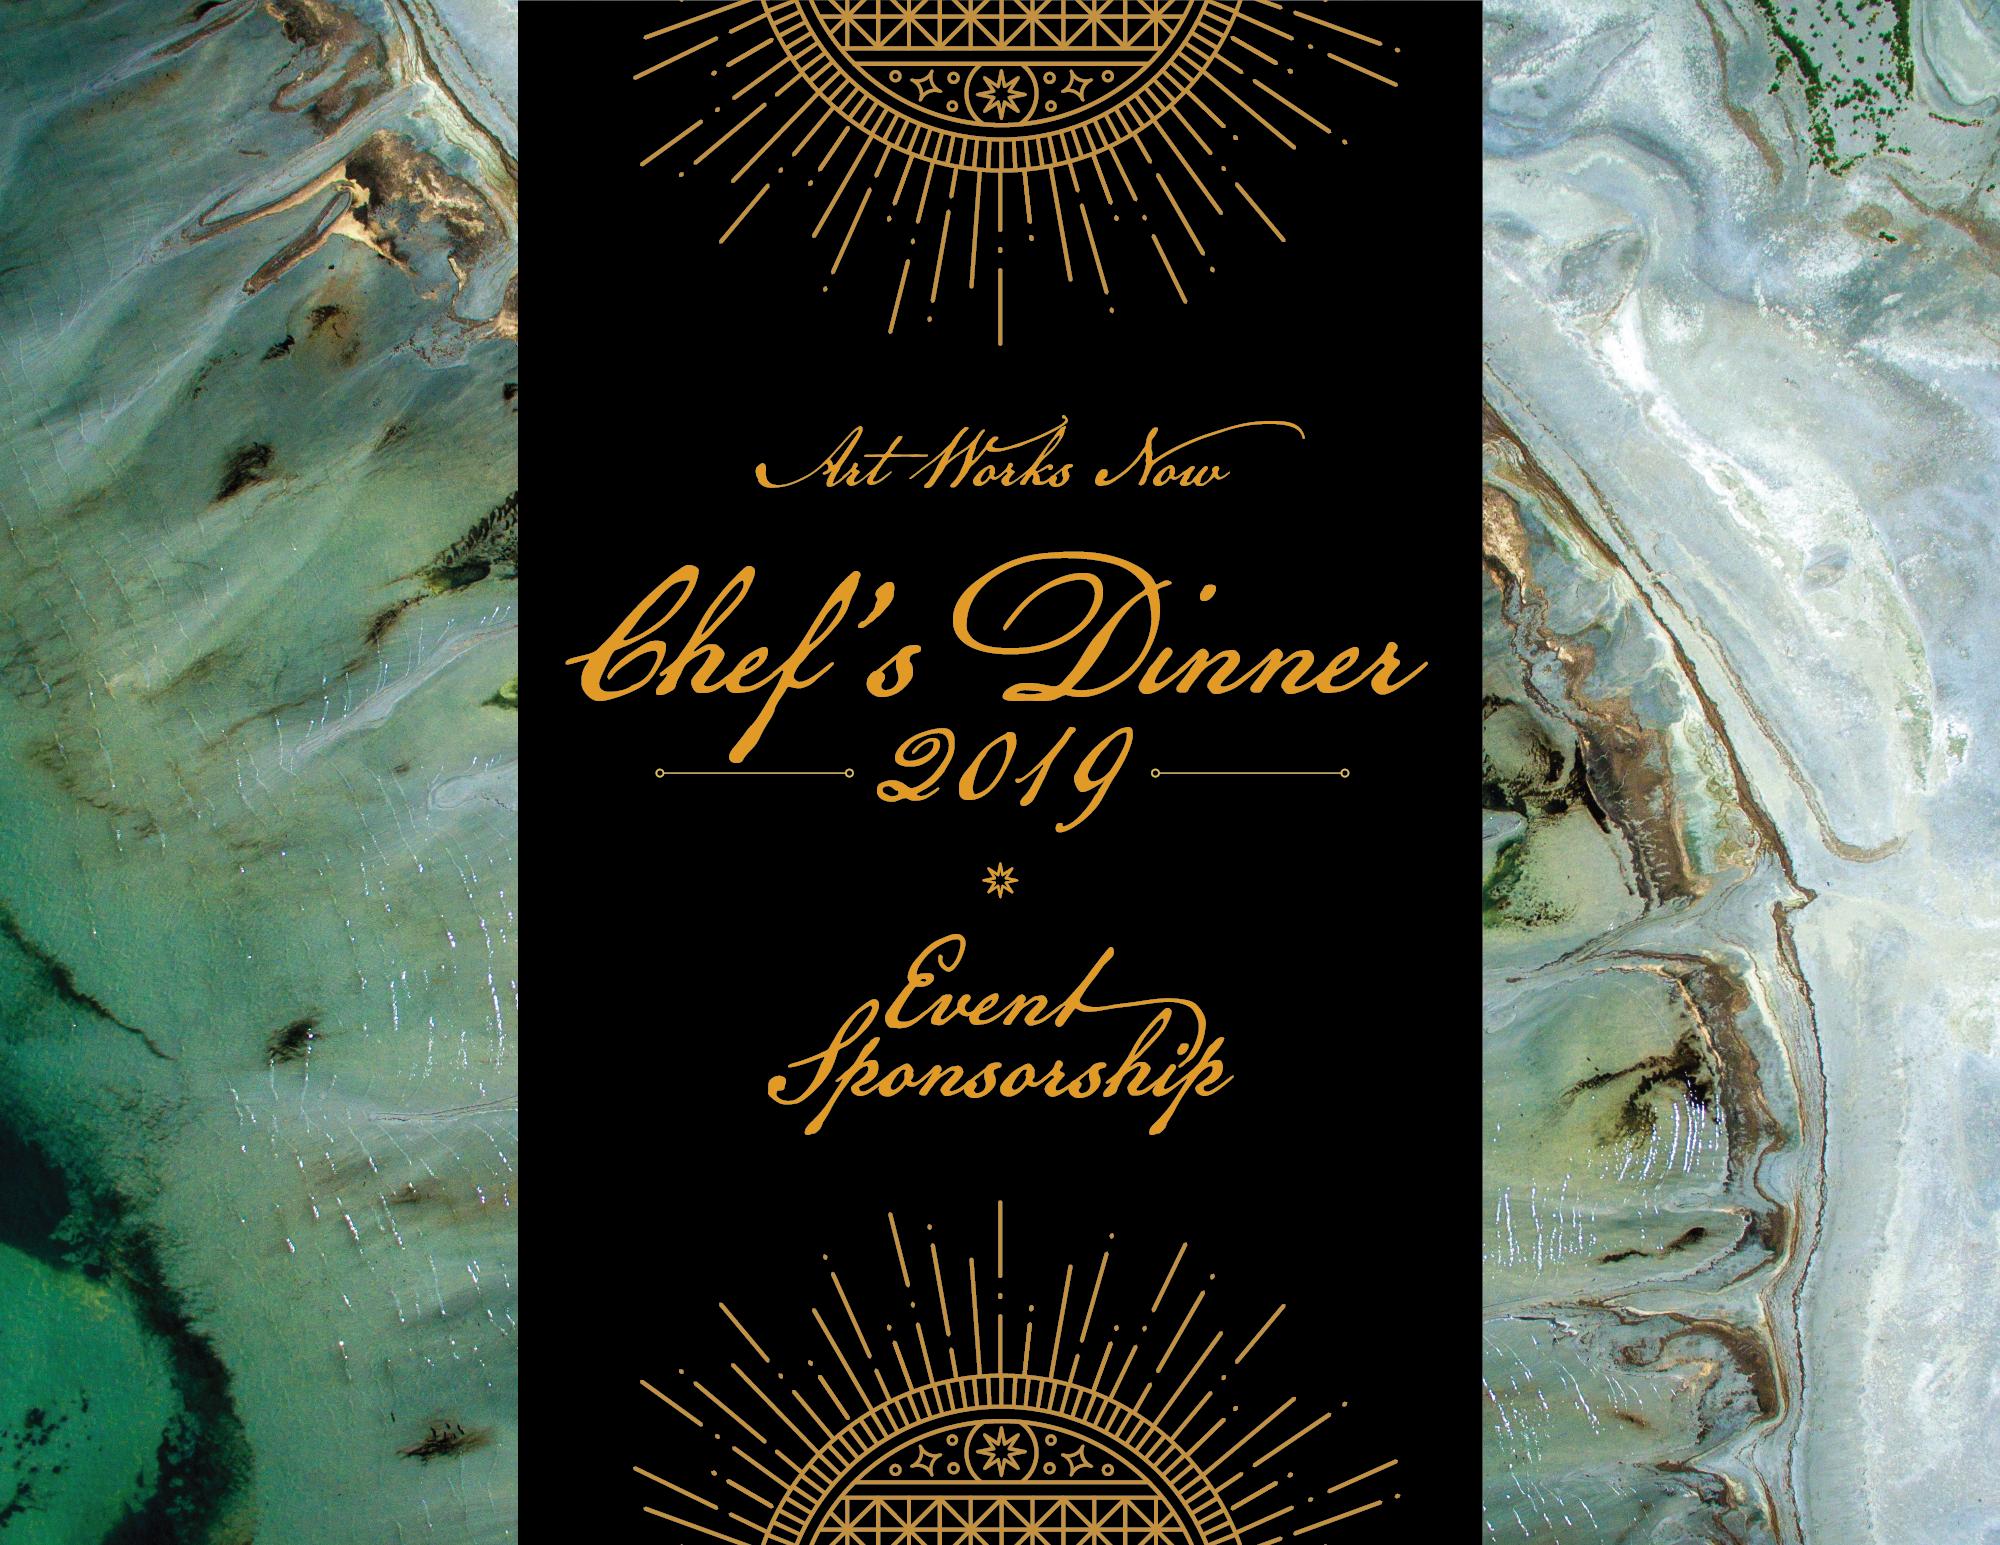 chef's-dinner-sponsor-sheets.png